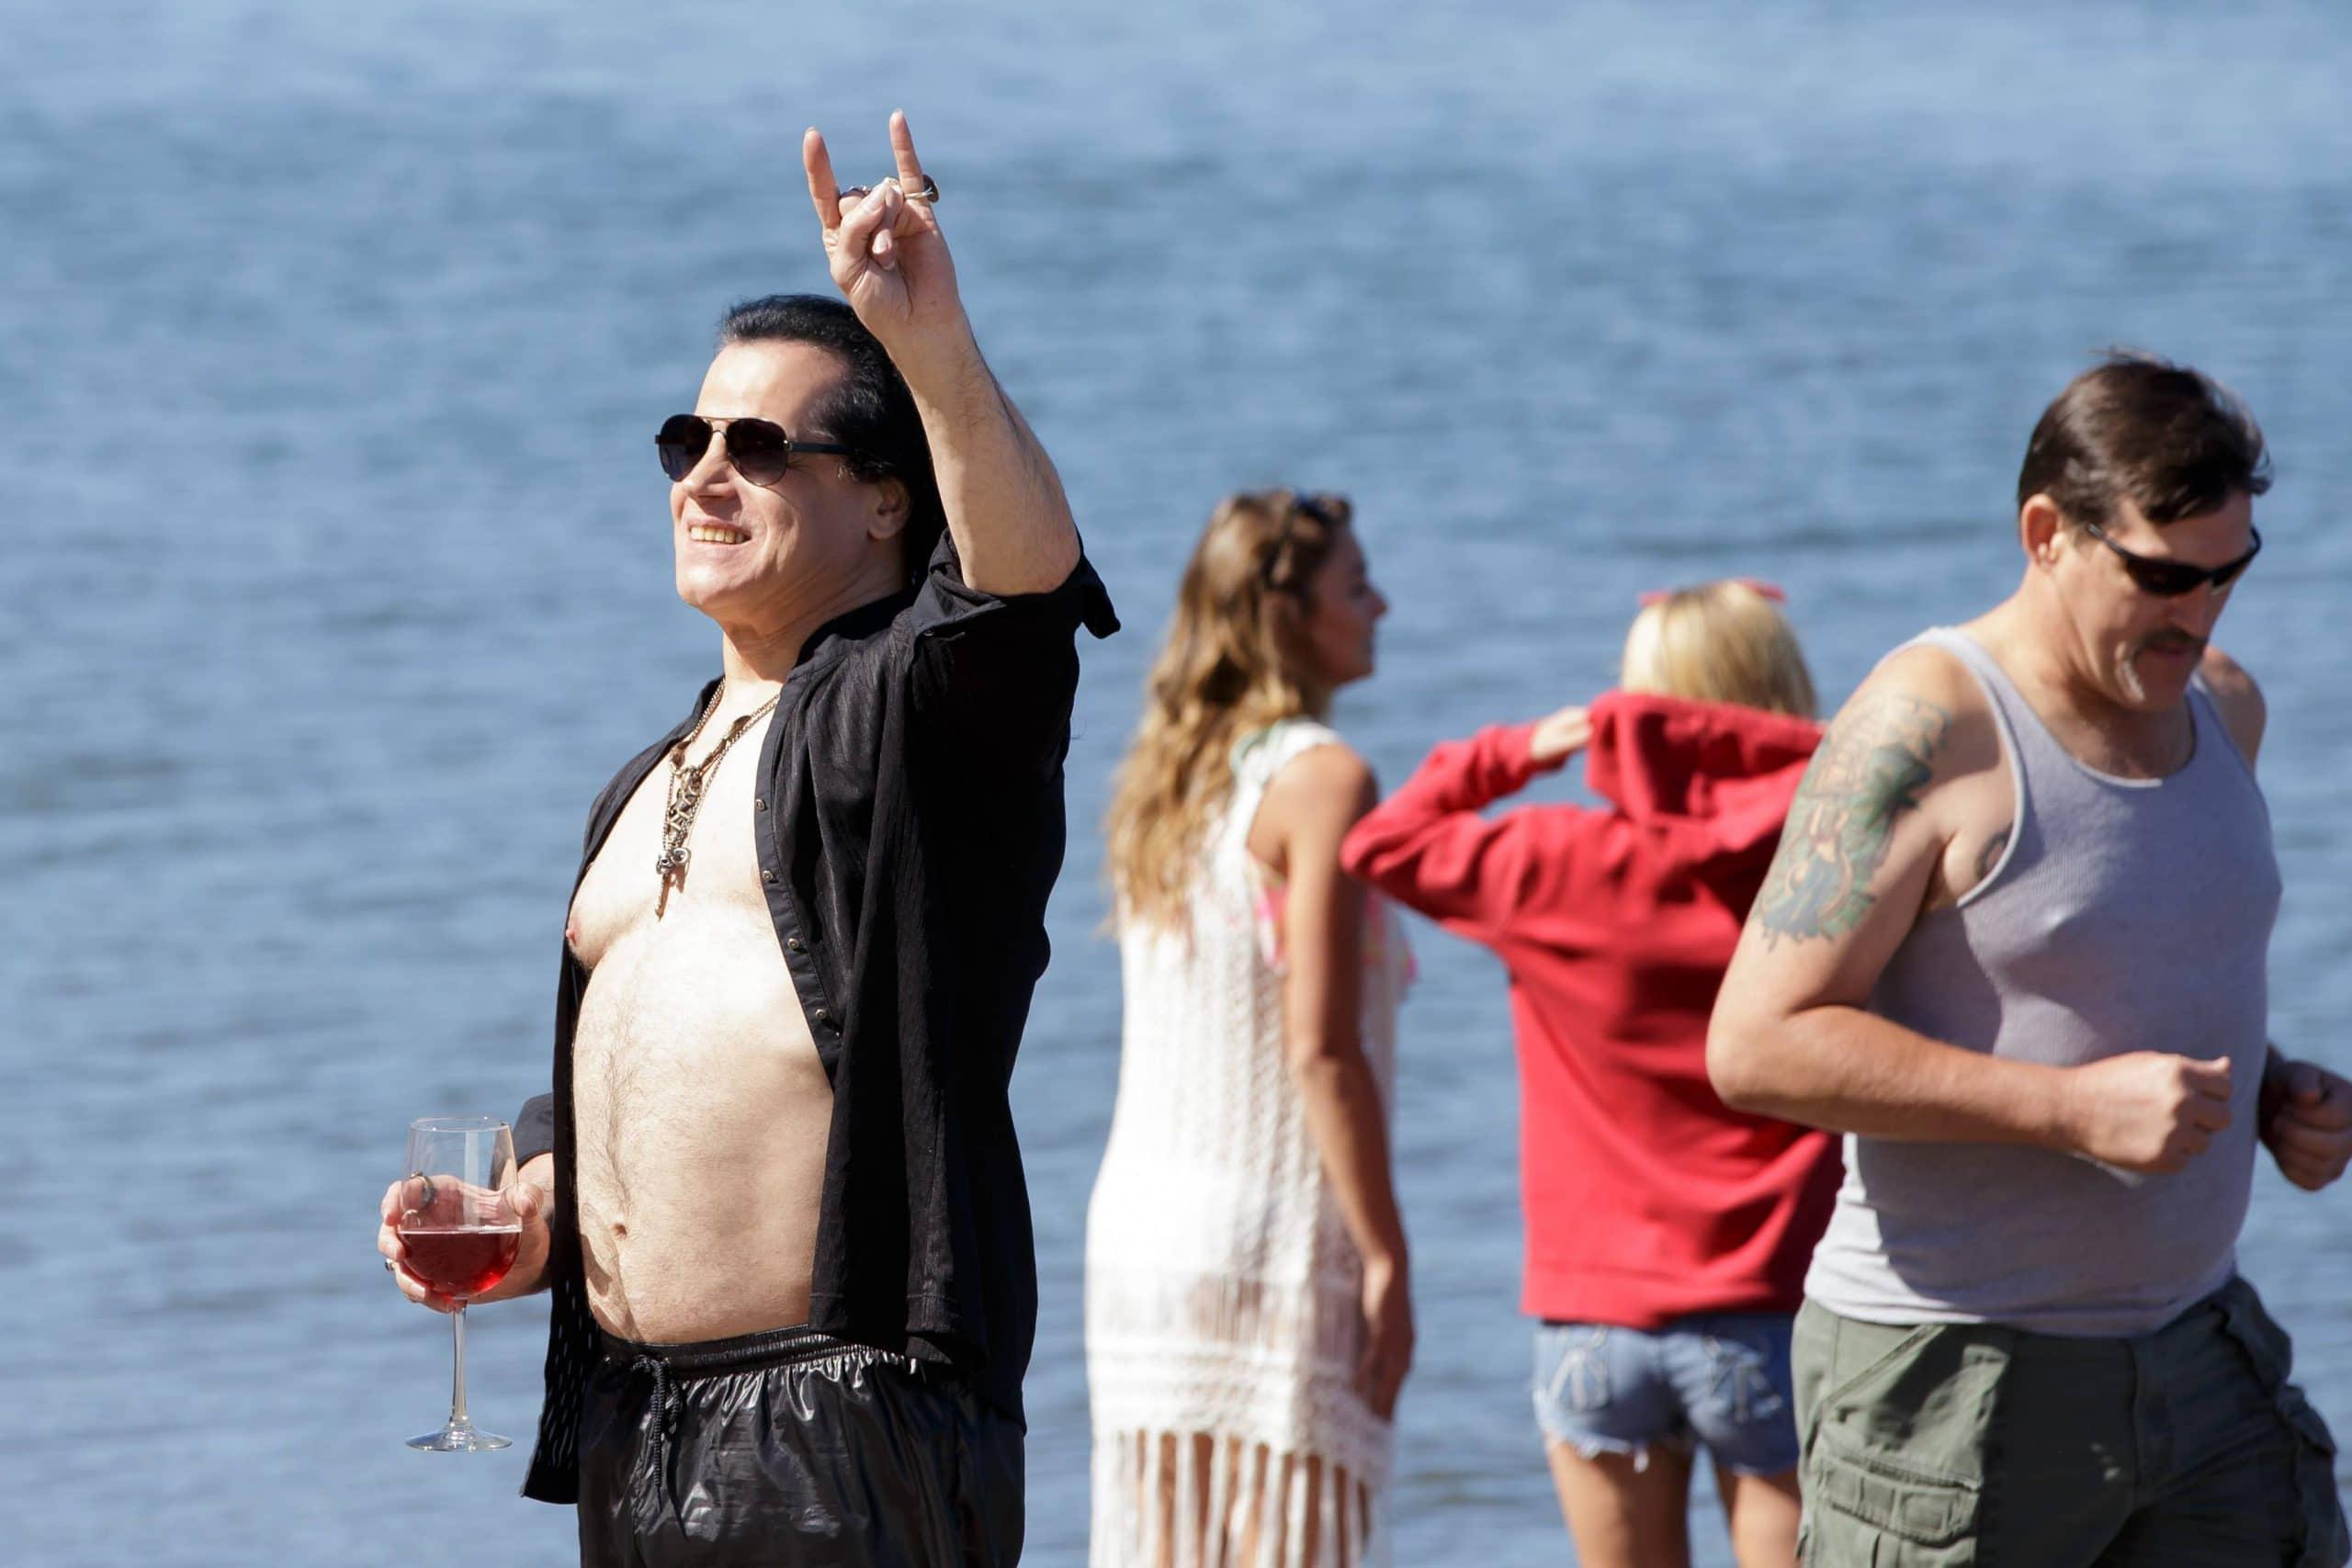 PORTLANDIA, Glenn Danzig in 'Weirdo Beach'